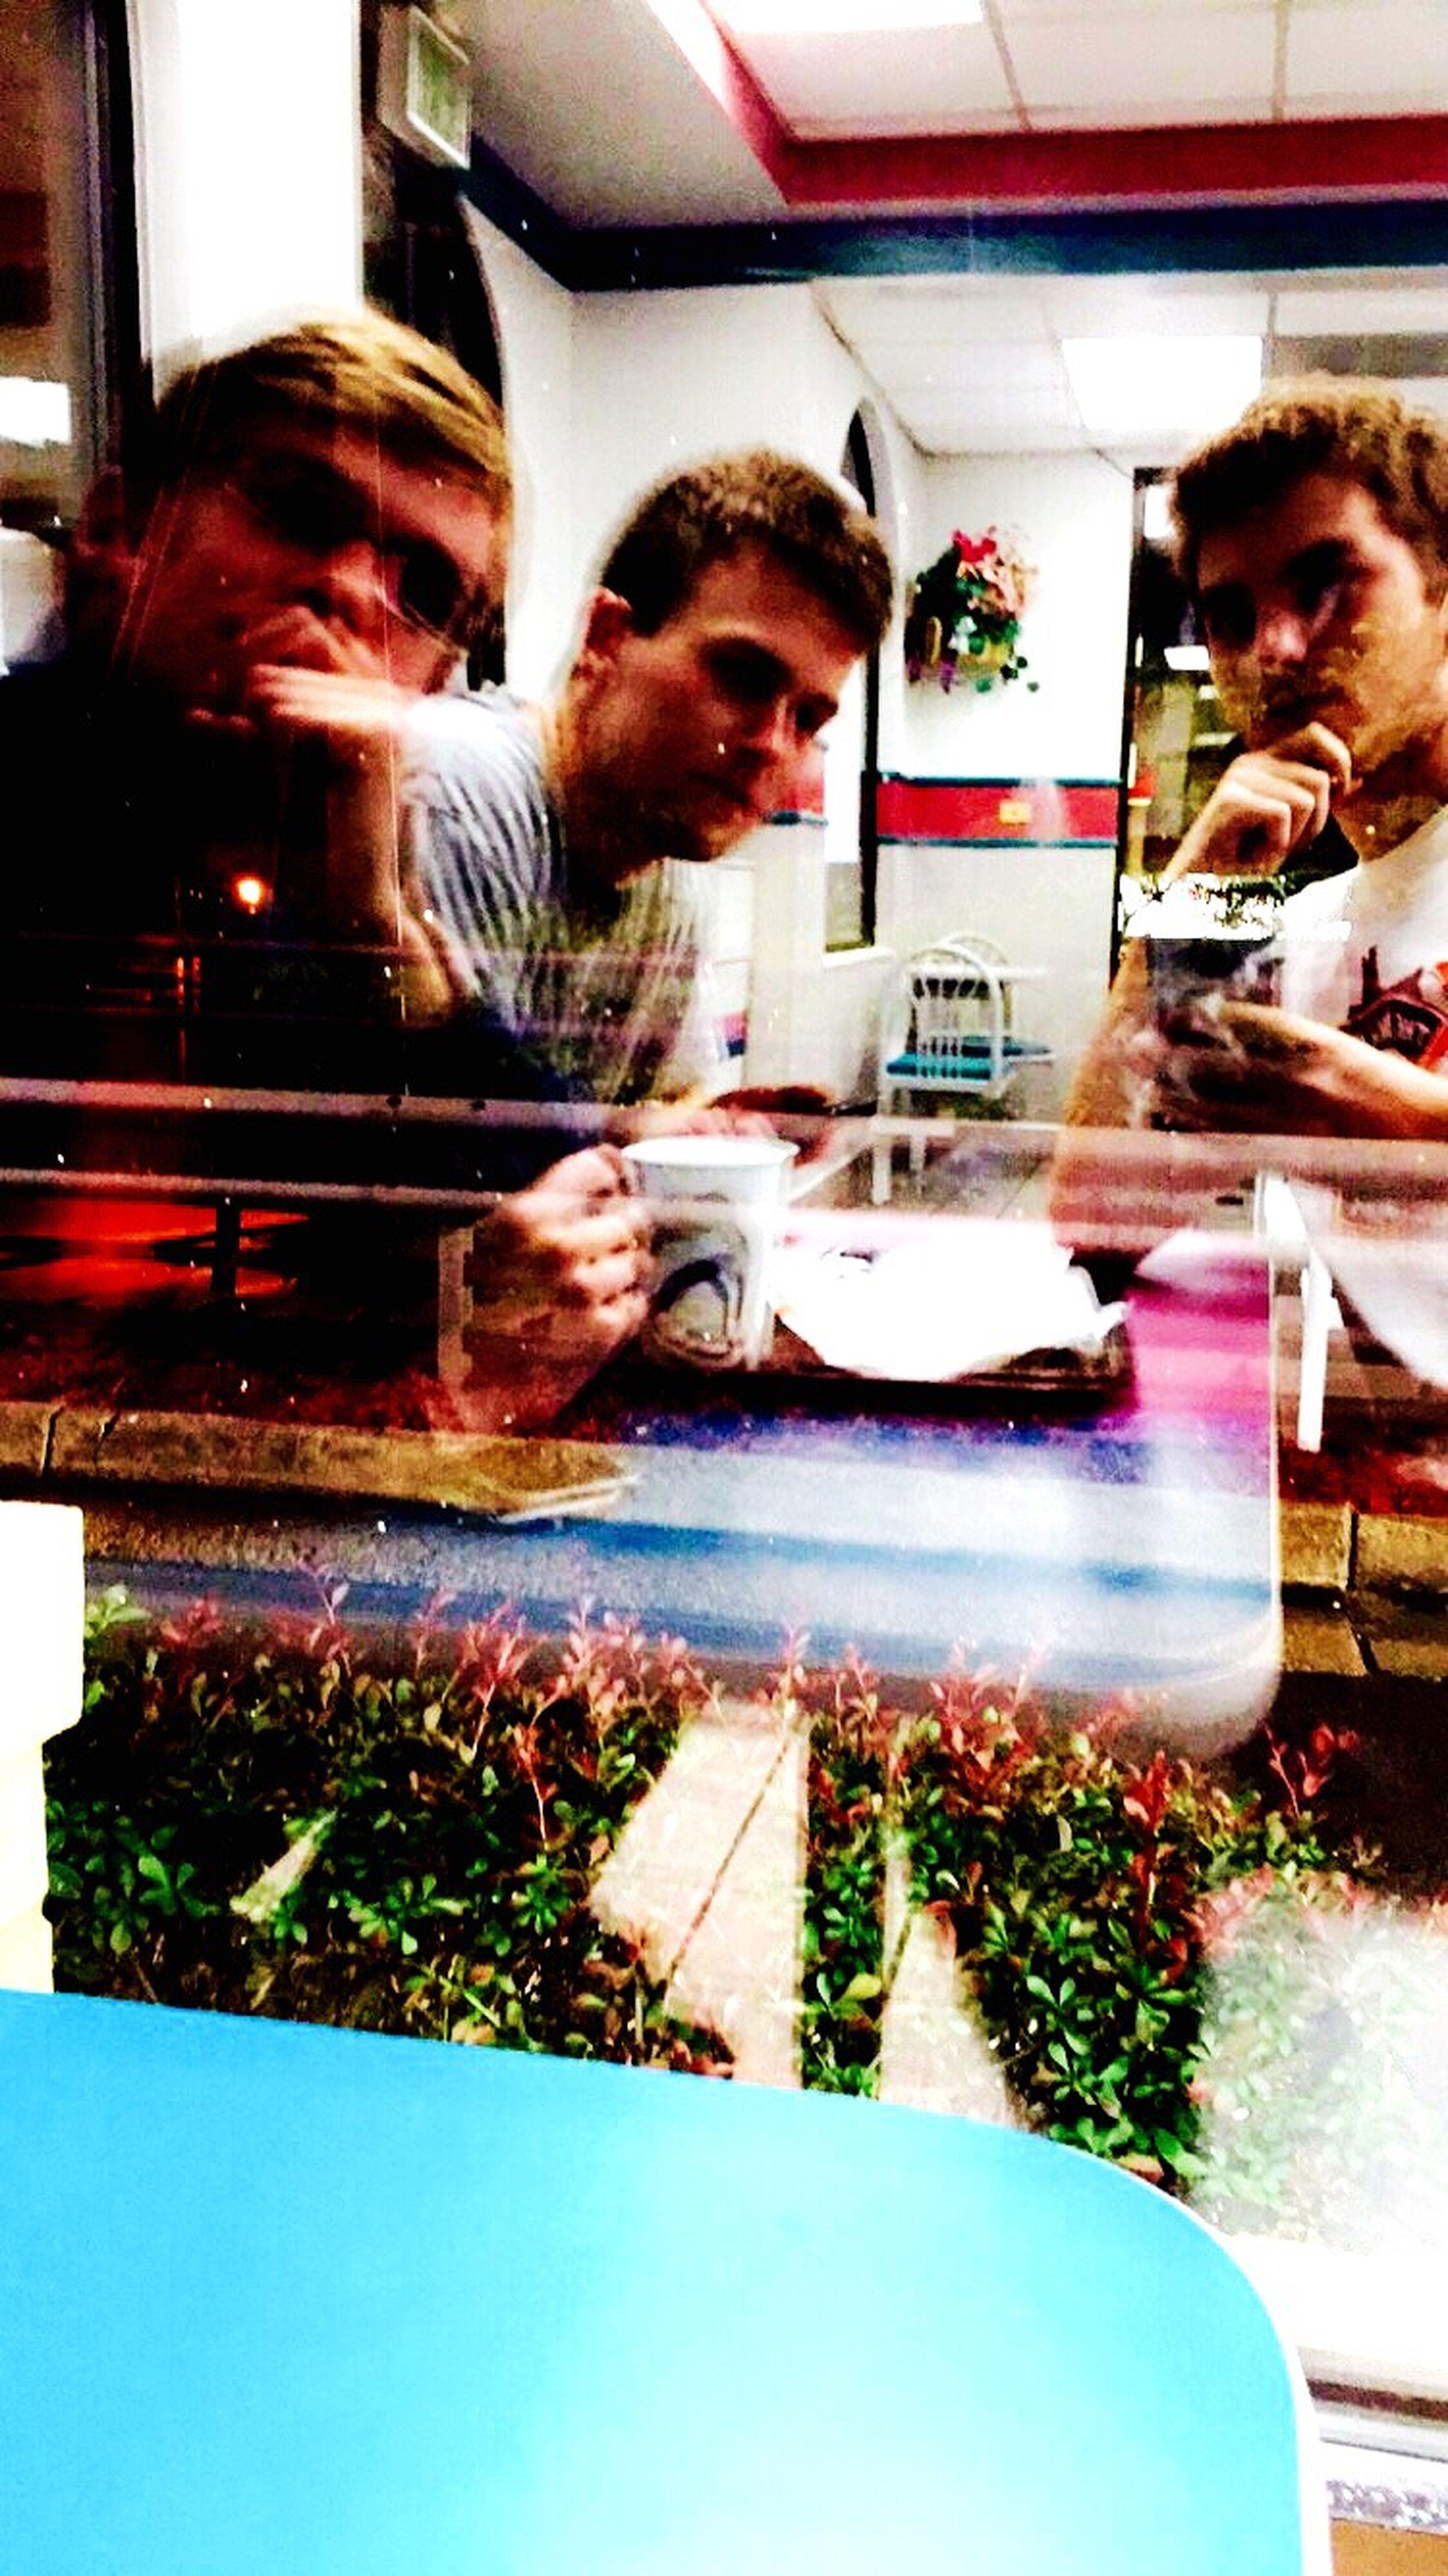 Taco Bell tuesday TBT  Nofilter Its 22:06 He's A Squid Baja Blast  UVA Club Swim Holy Cross Club Swim Virginia Tech Club Swim I Believe That Fish And Human Beings Can Coexist - Kevin J Finn